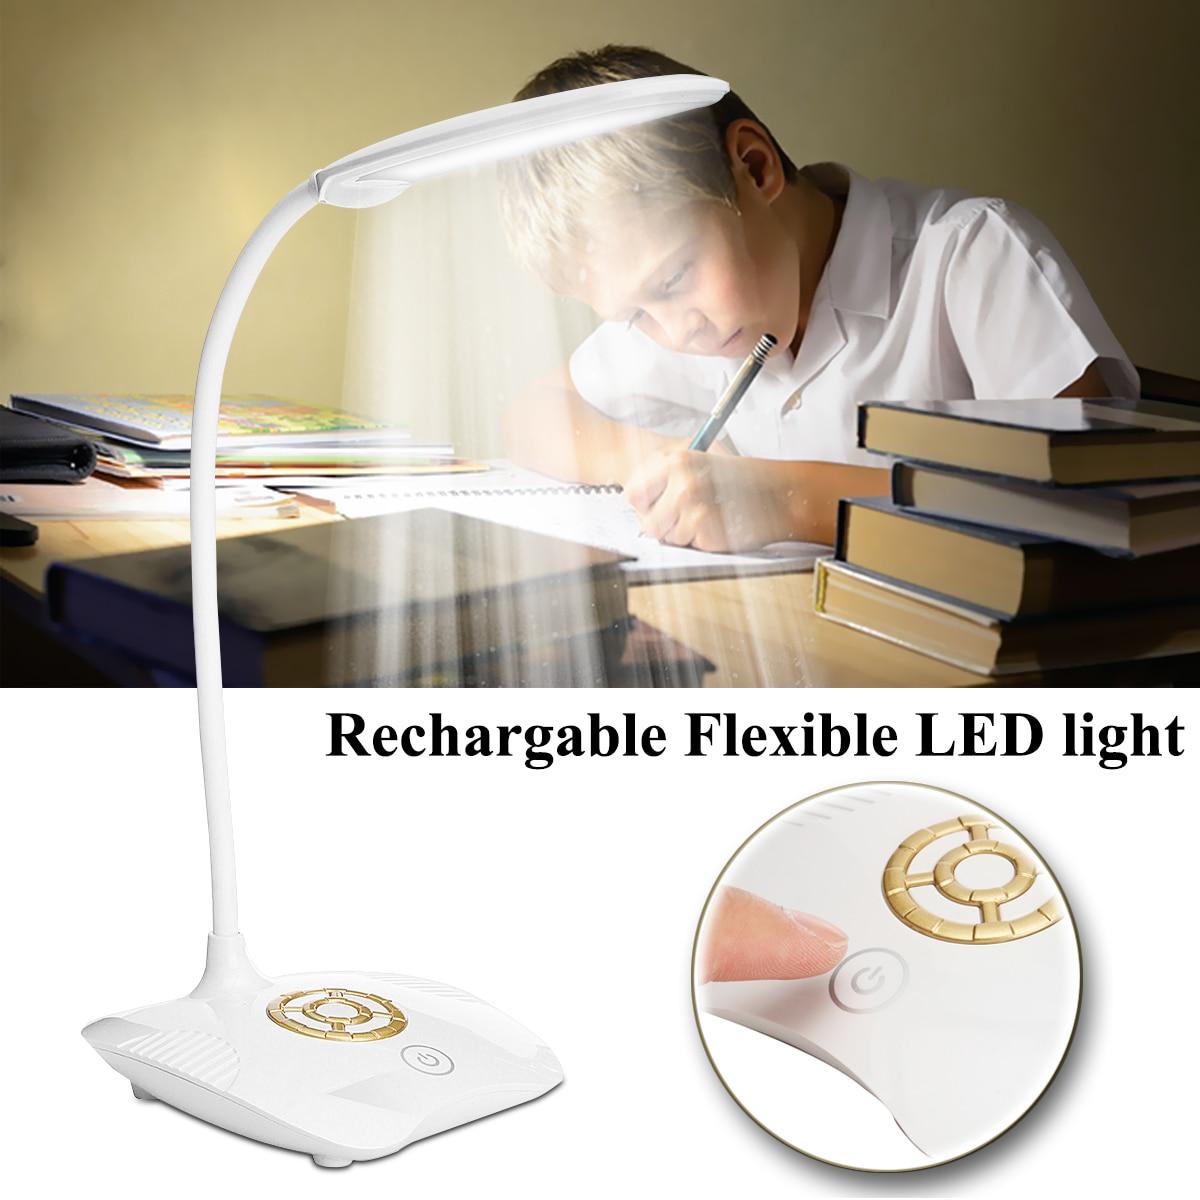 цена 3 Brightness Flexible Rechargeable Battery Book Lamps Dimmable USB LED Night Light Bedside Desktop Reading Desk Lamp Portable